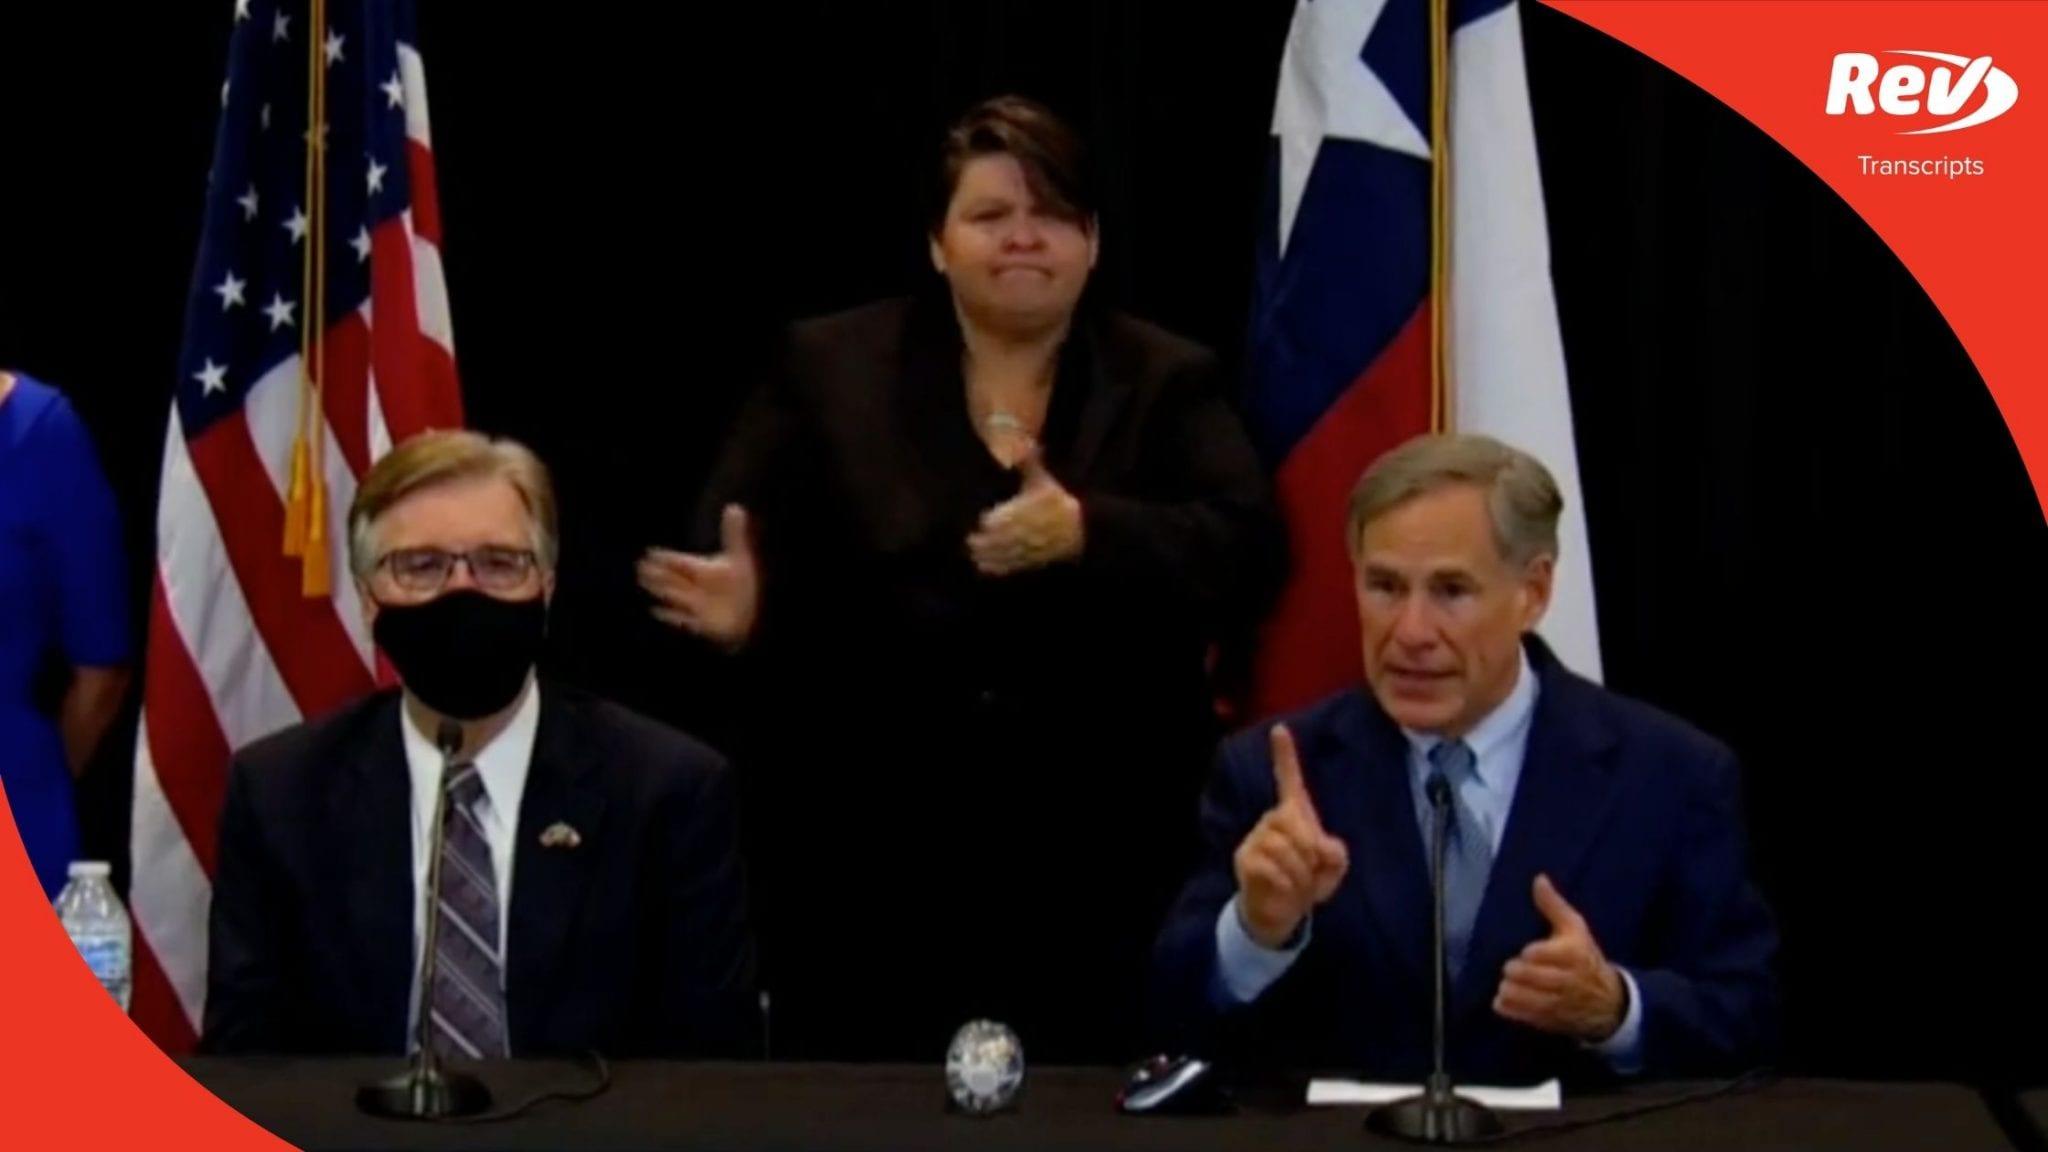 Texas Gov. Greg Abbott Press Conference Transcript August 18: Police Funding